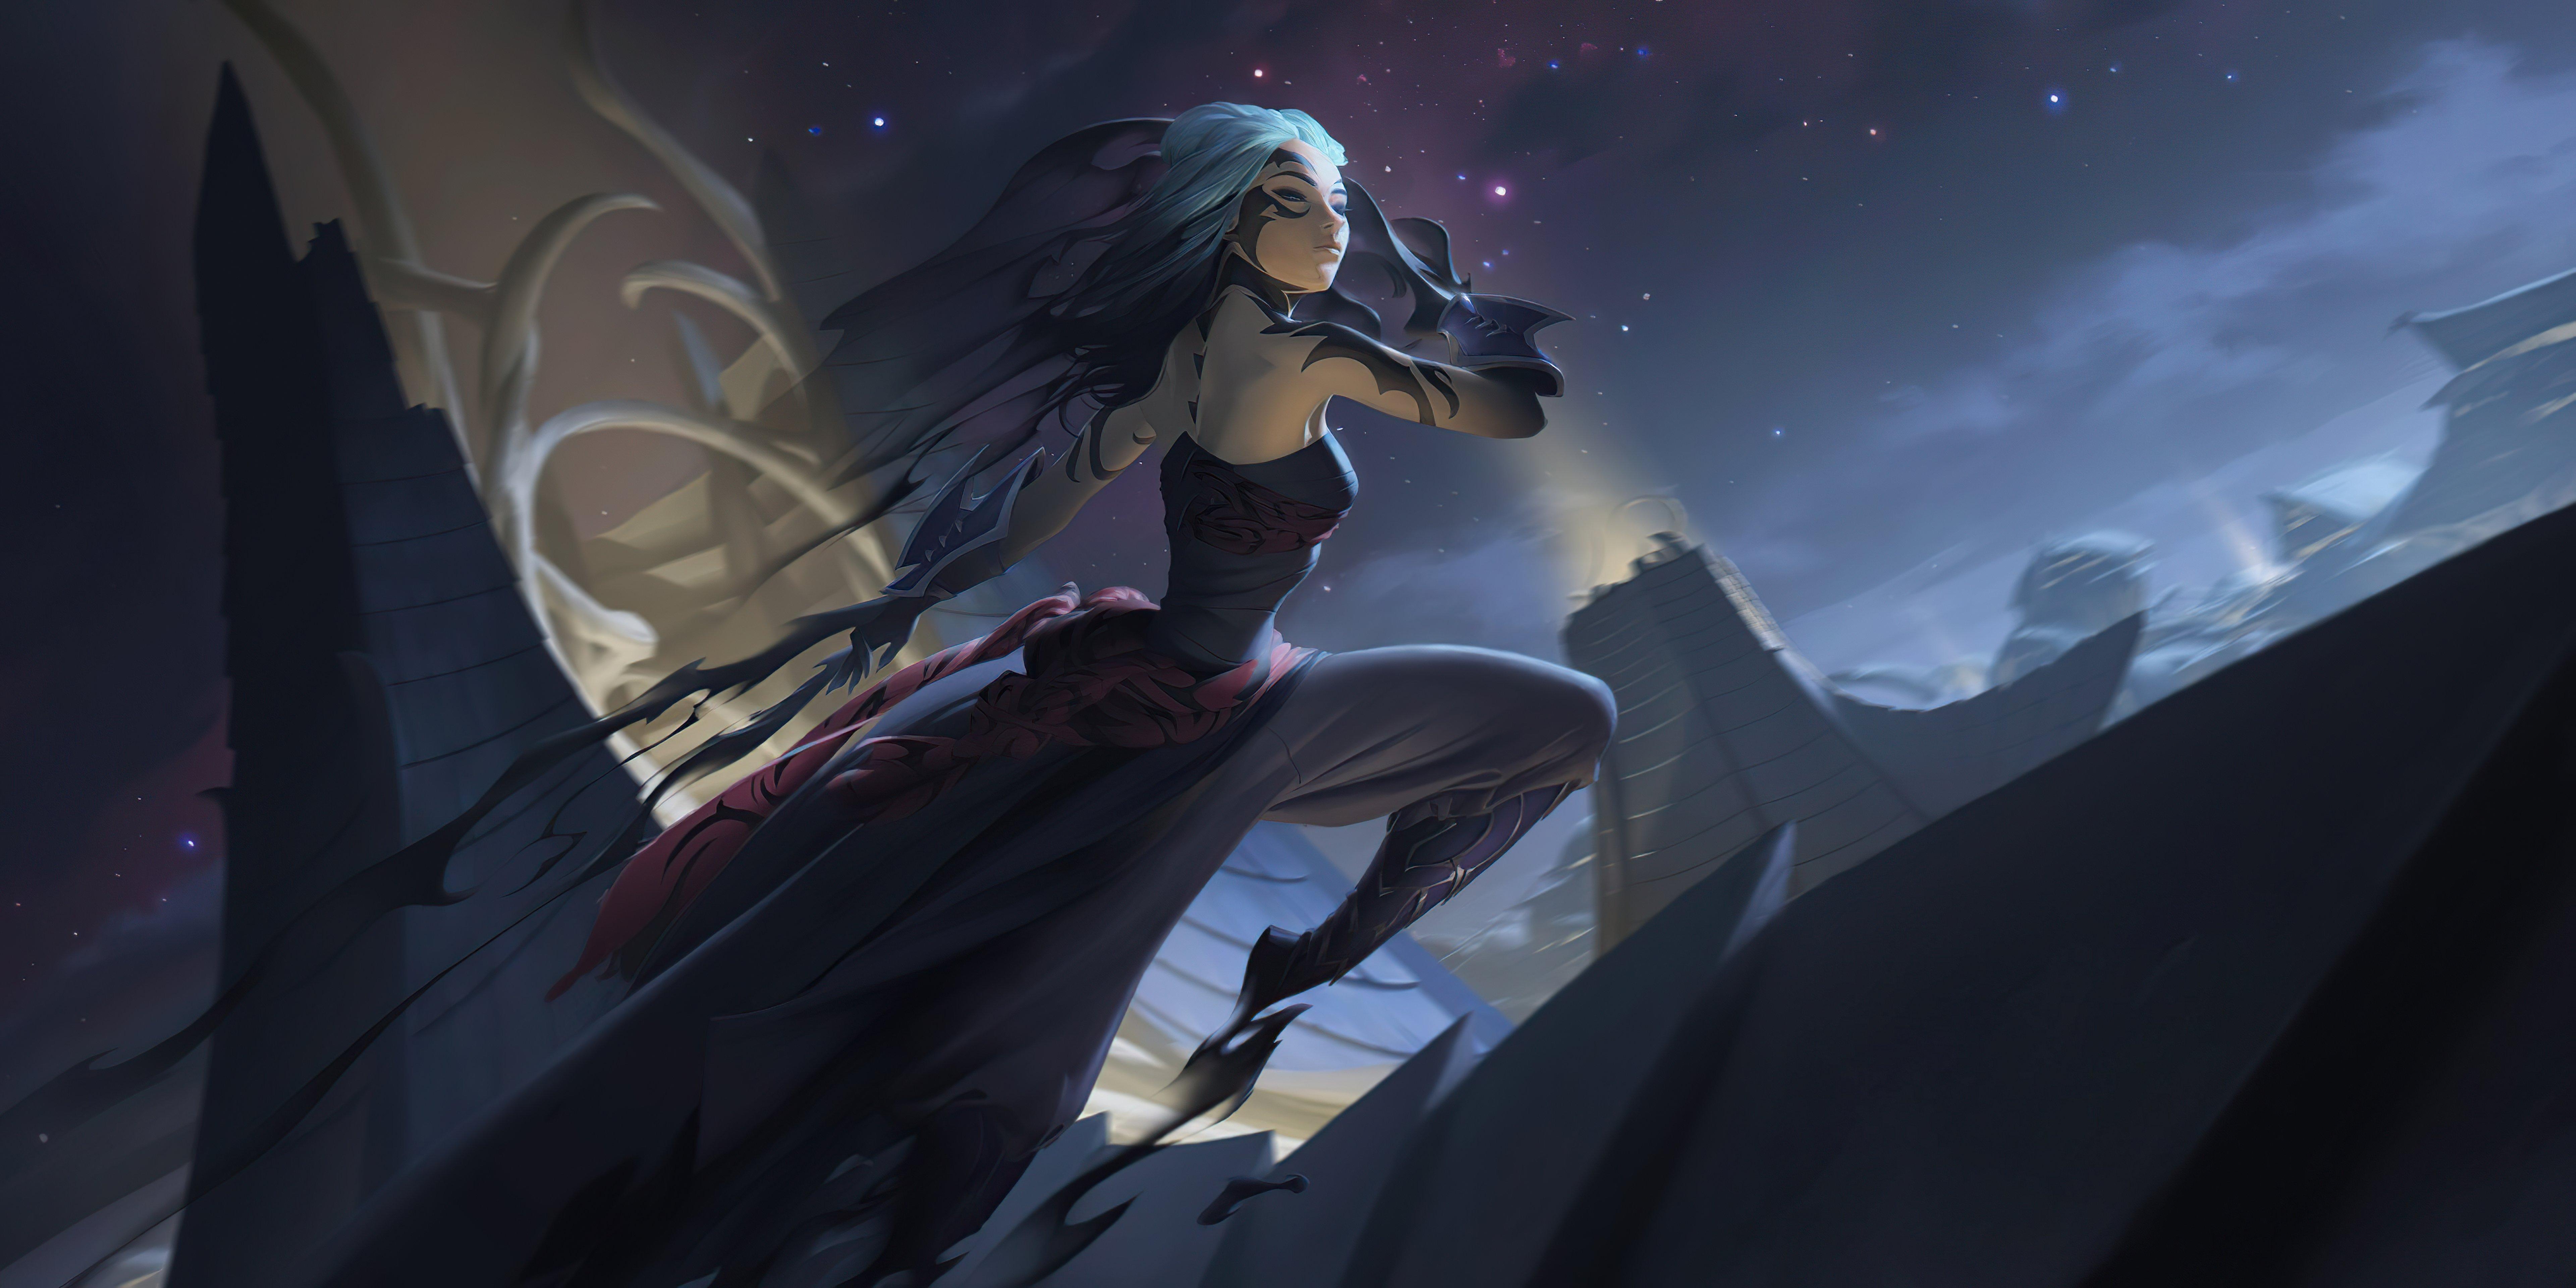 Fondos de pantalla Shadow Assassin Legends of Runeterra